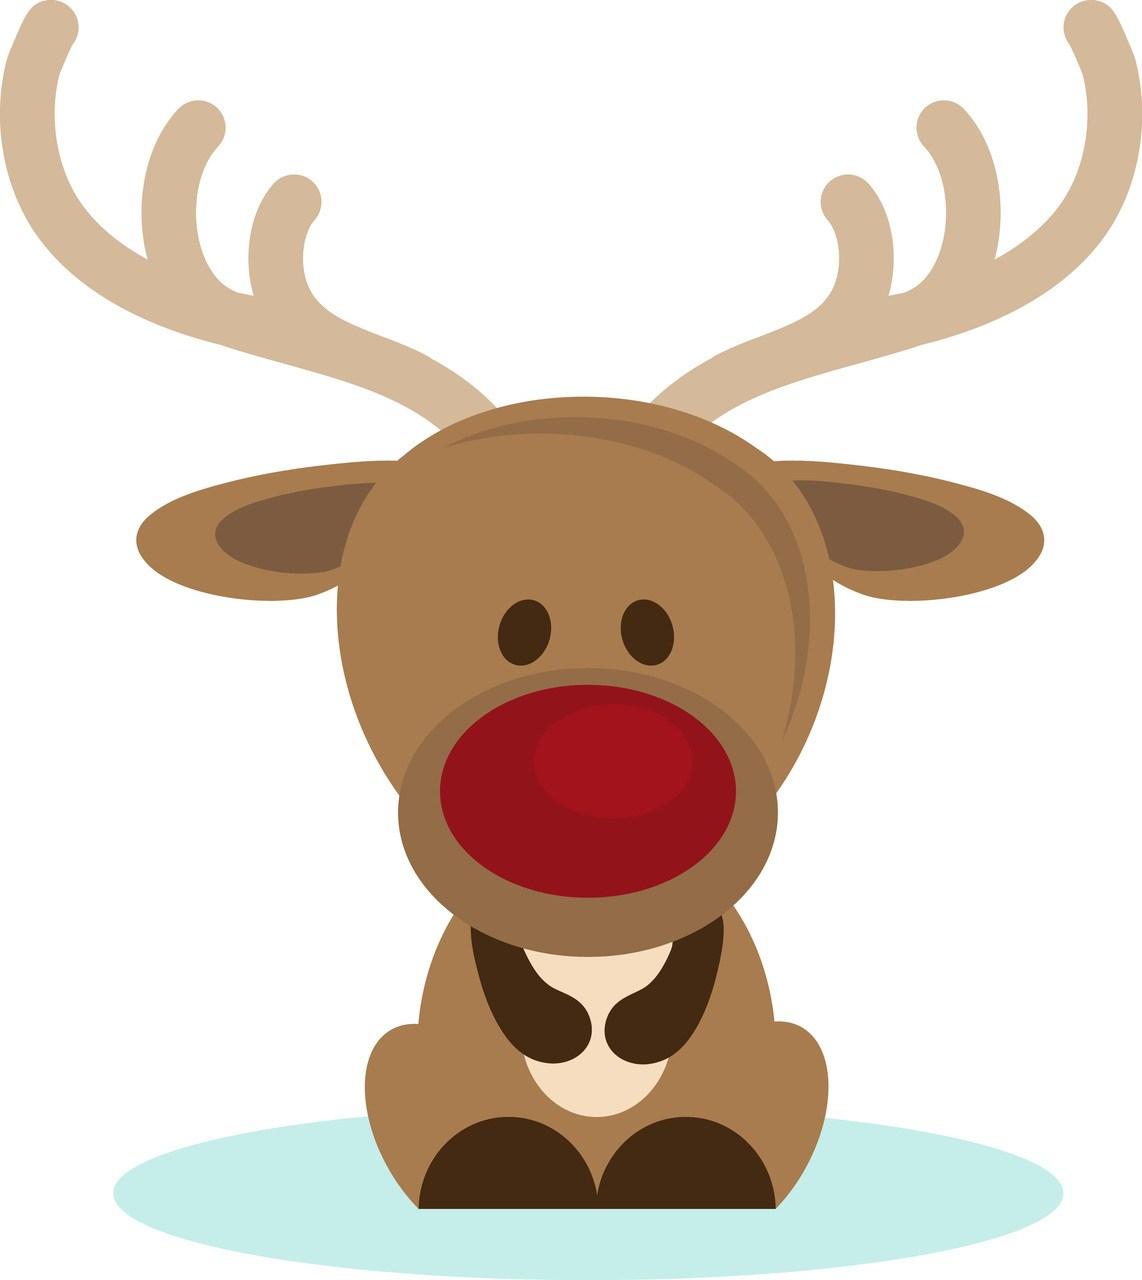 Cute christmas reindeer clipart 3 » Clipart Portal.